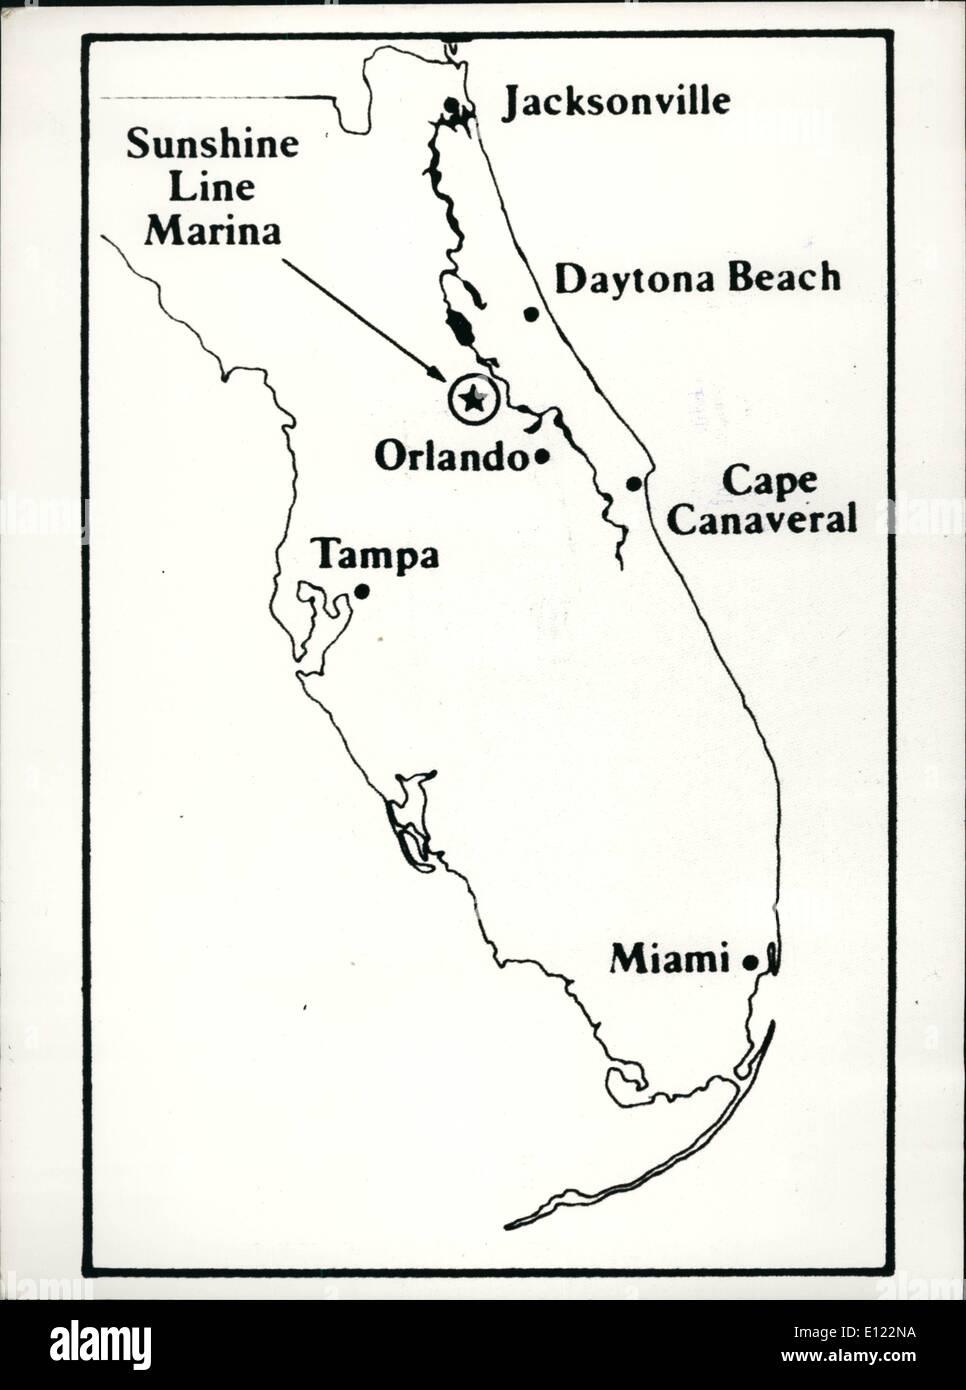 St Johns Florida Map.May 05 1982 River Cruising In Florida Map Showing Florida State